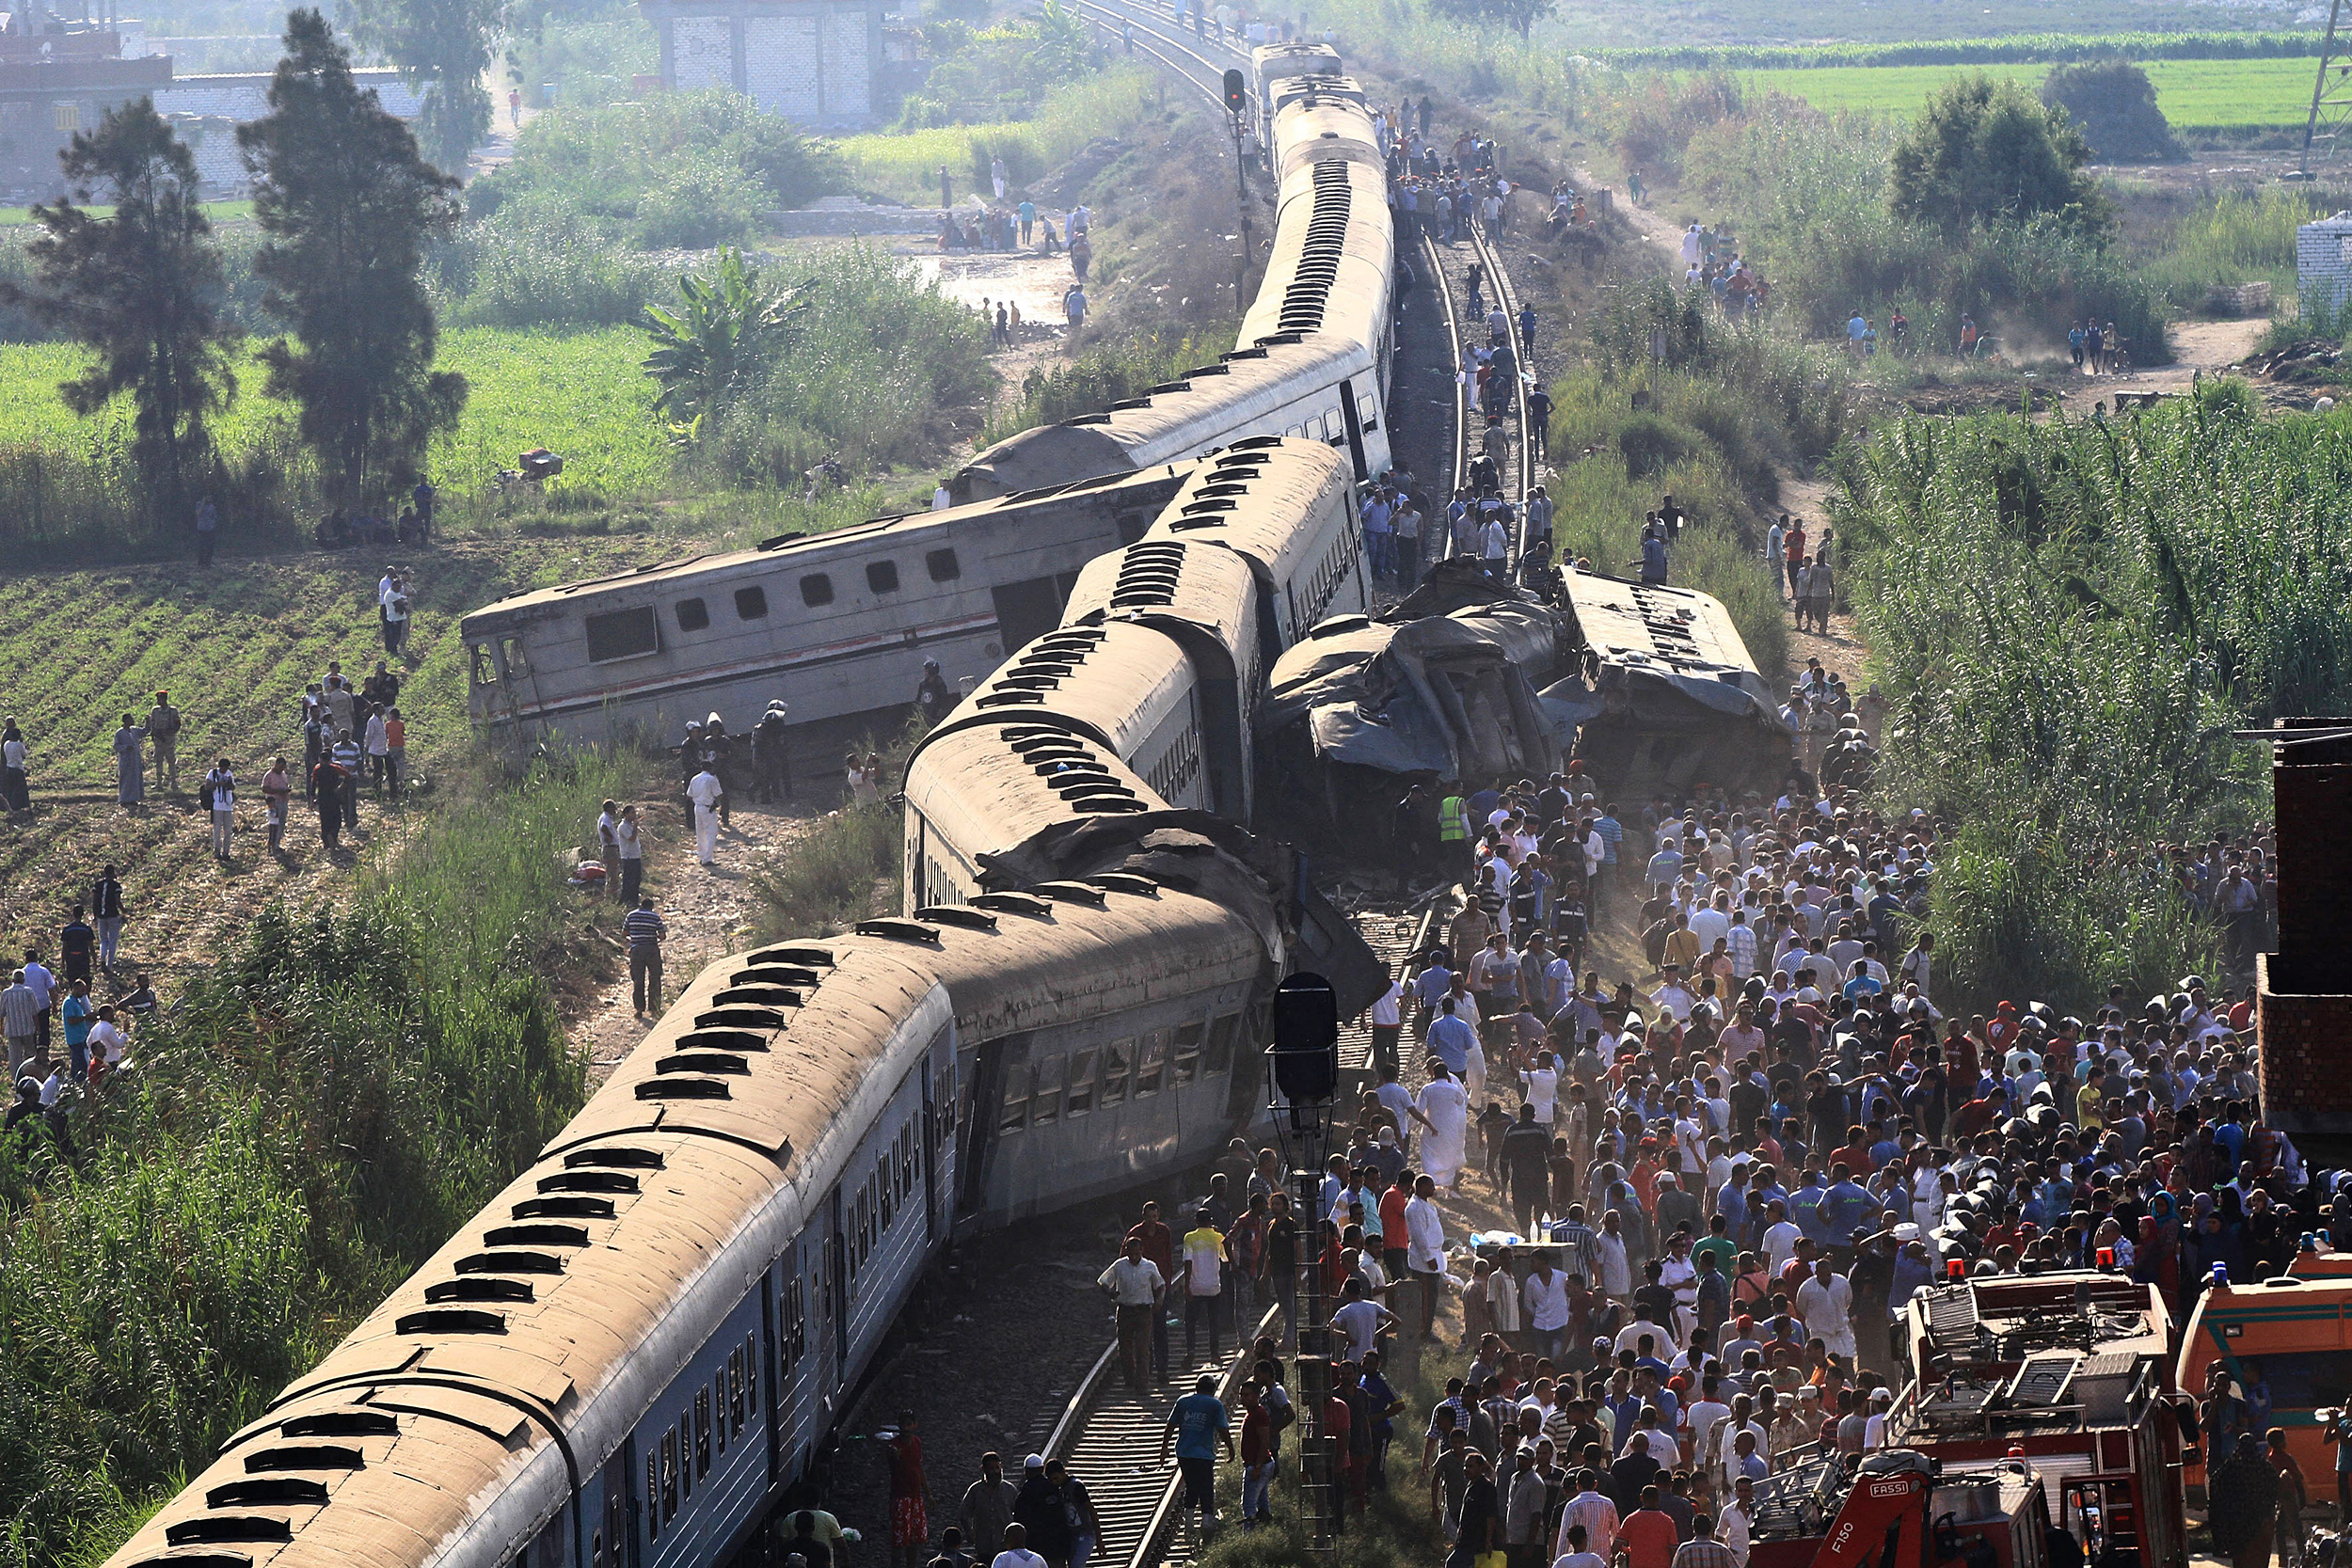 170811-egypt-train-accident-ew-115p_ac8caabf0f42c7ed0bbf56a1200420d6.jpg